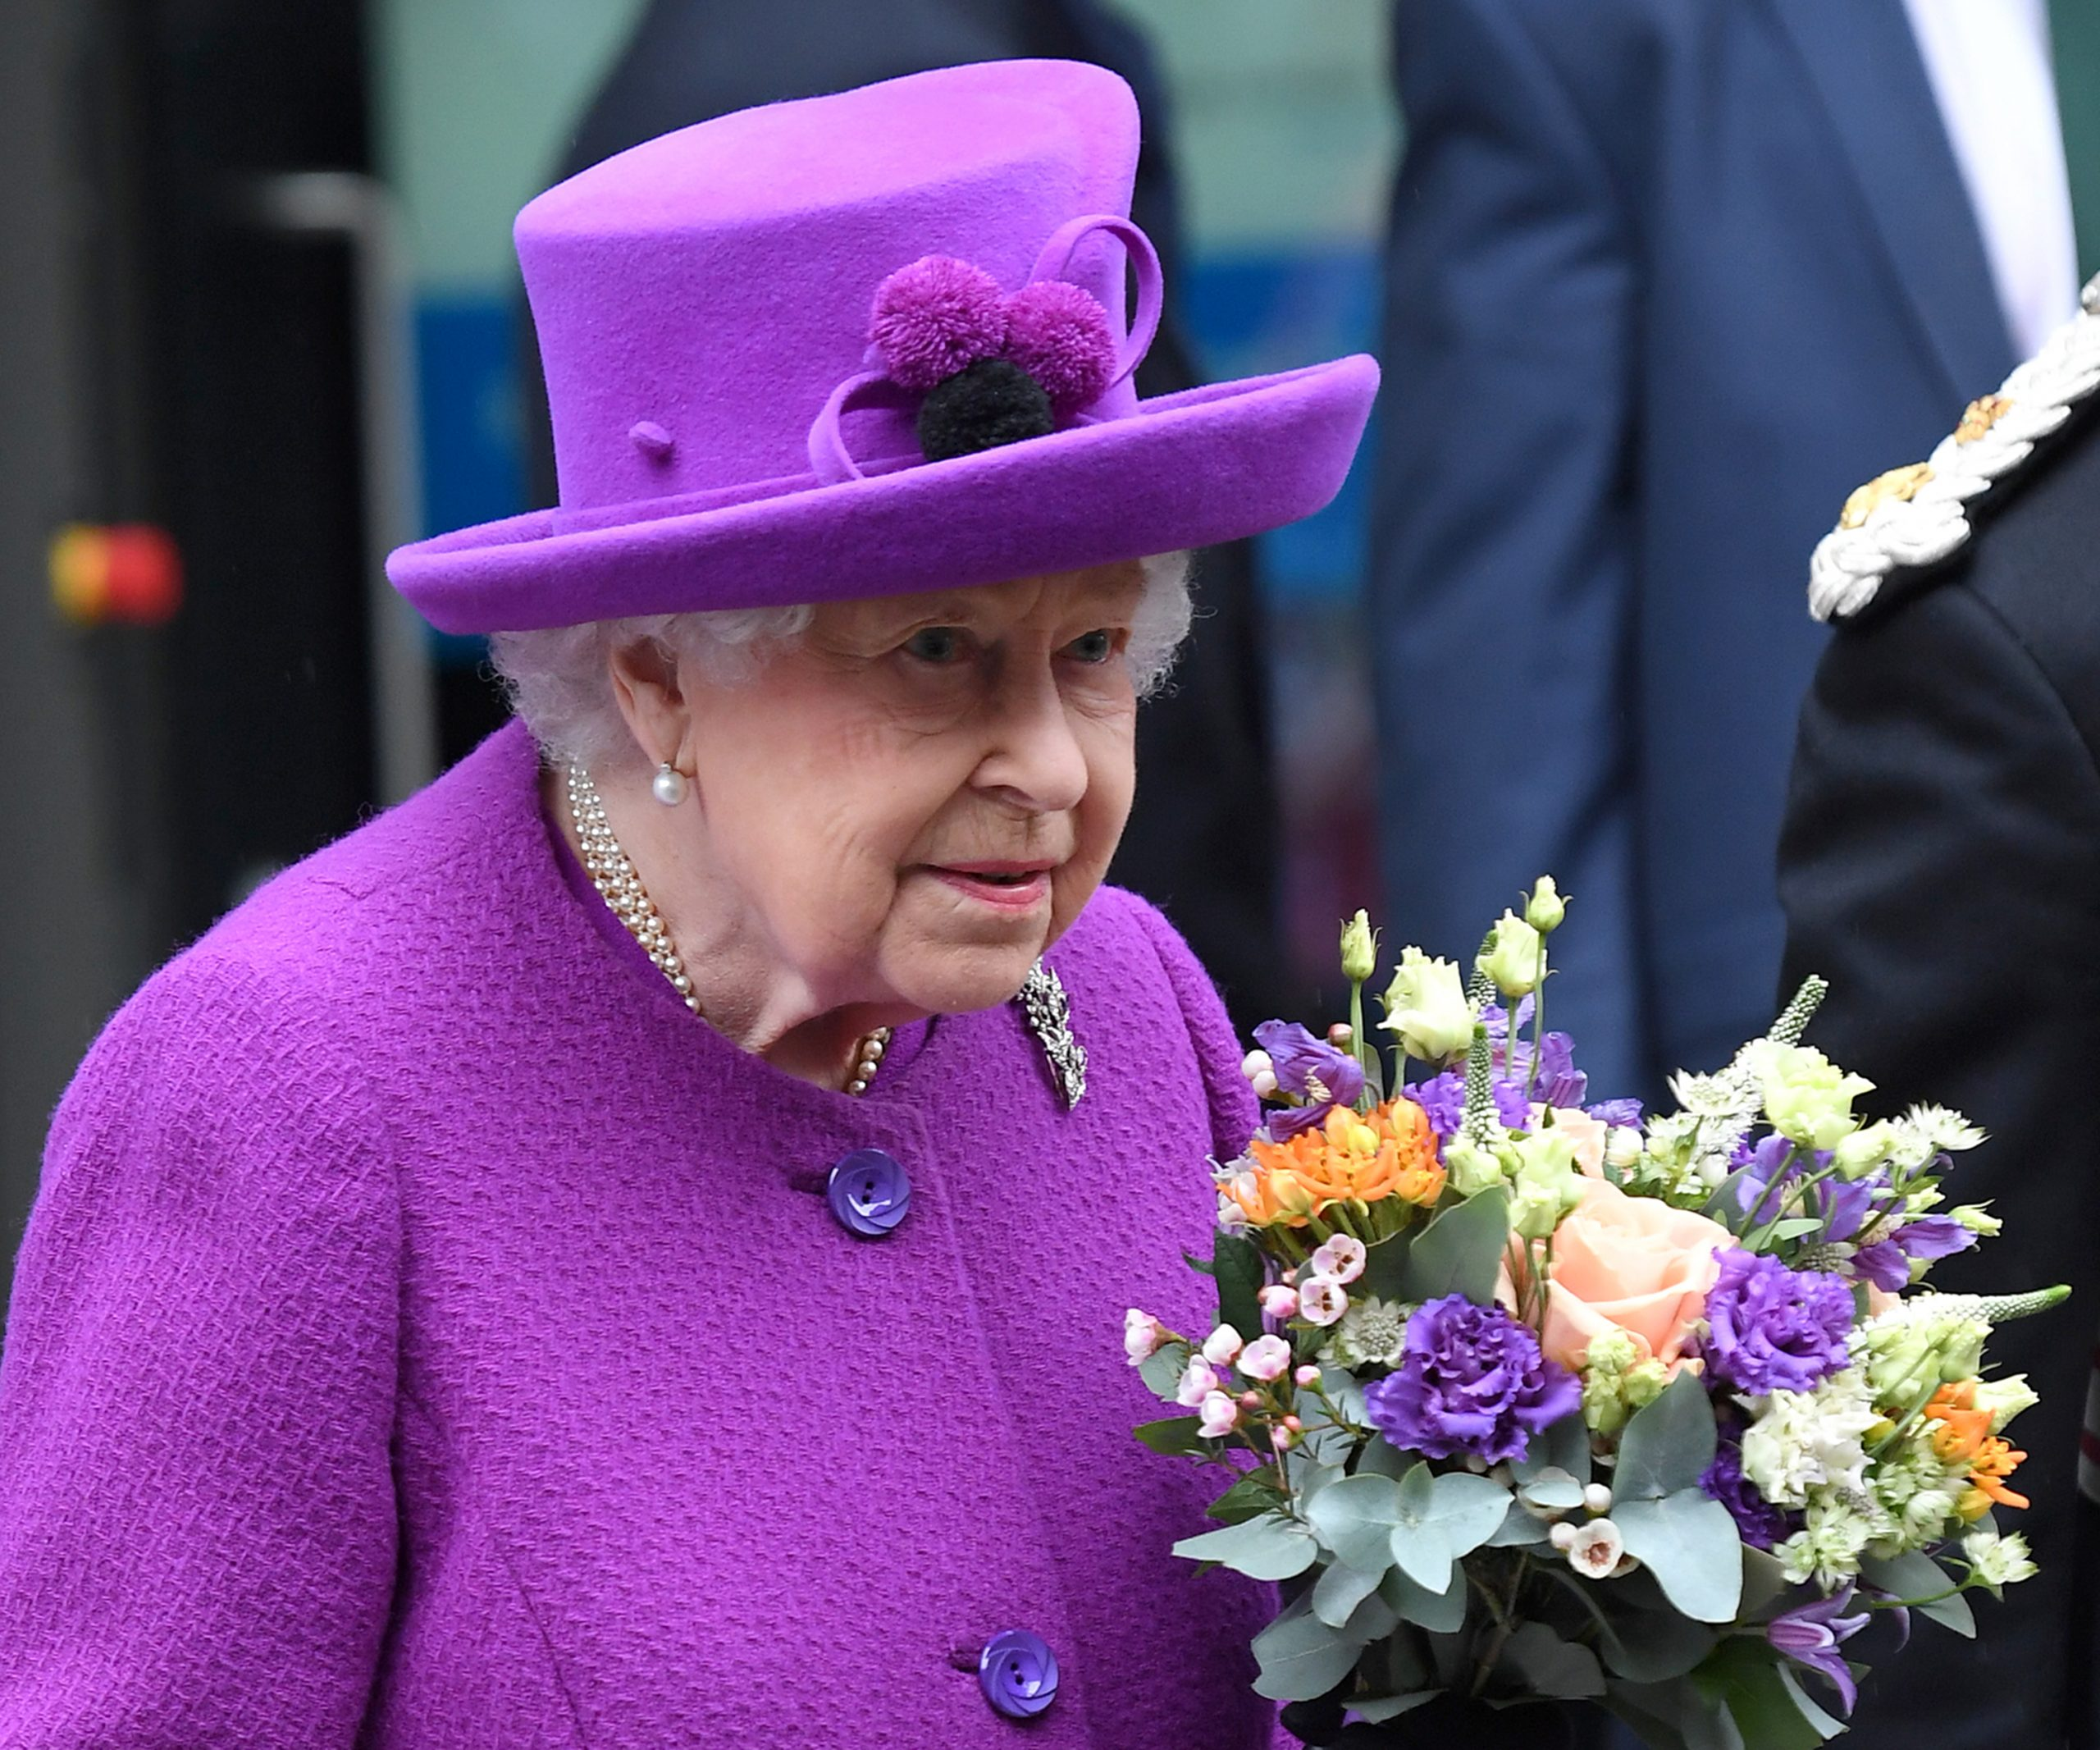 Coronavirus: Buckingham Palace insists Queen 'in good health' as Boris Johnson contracts COVID-19